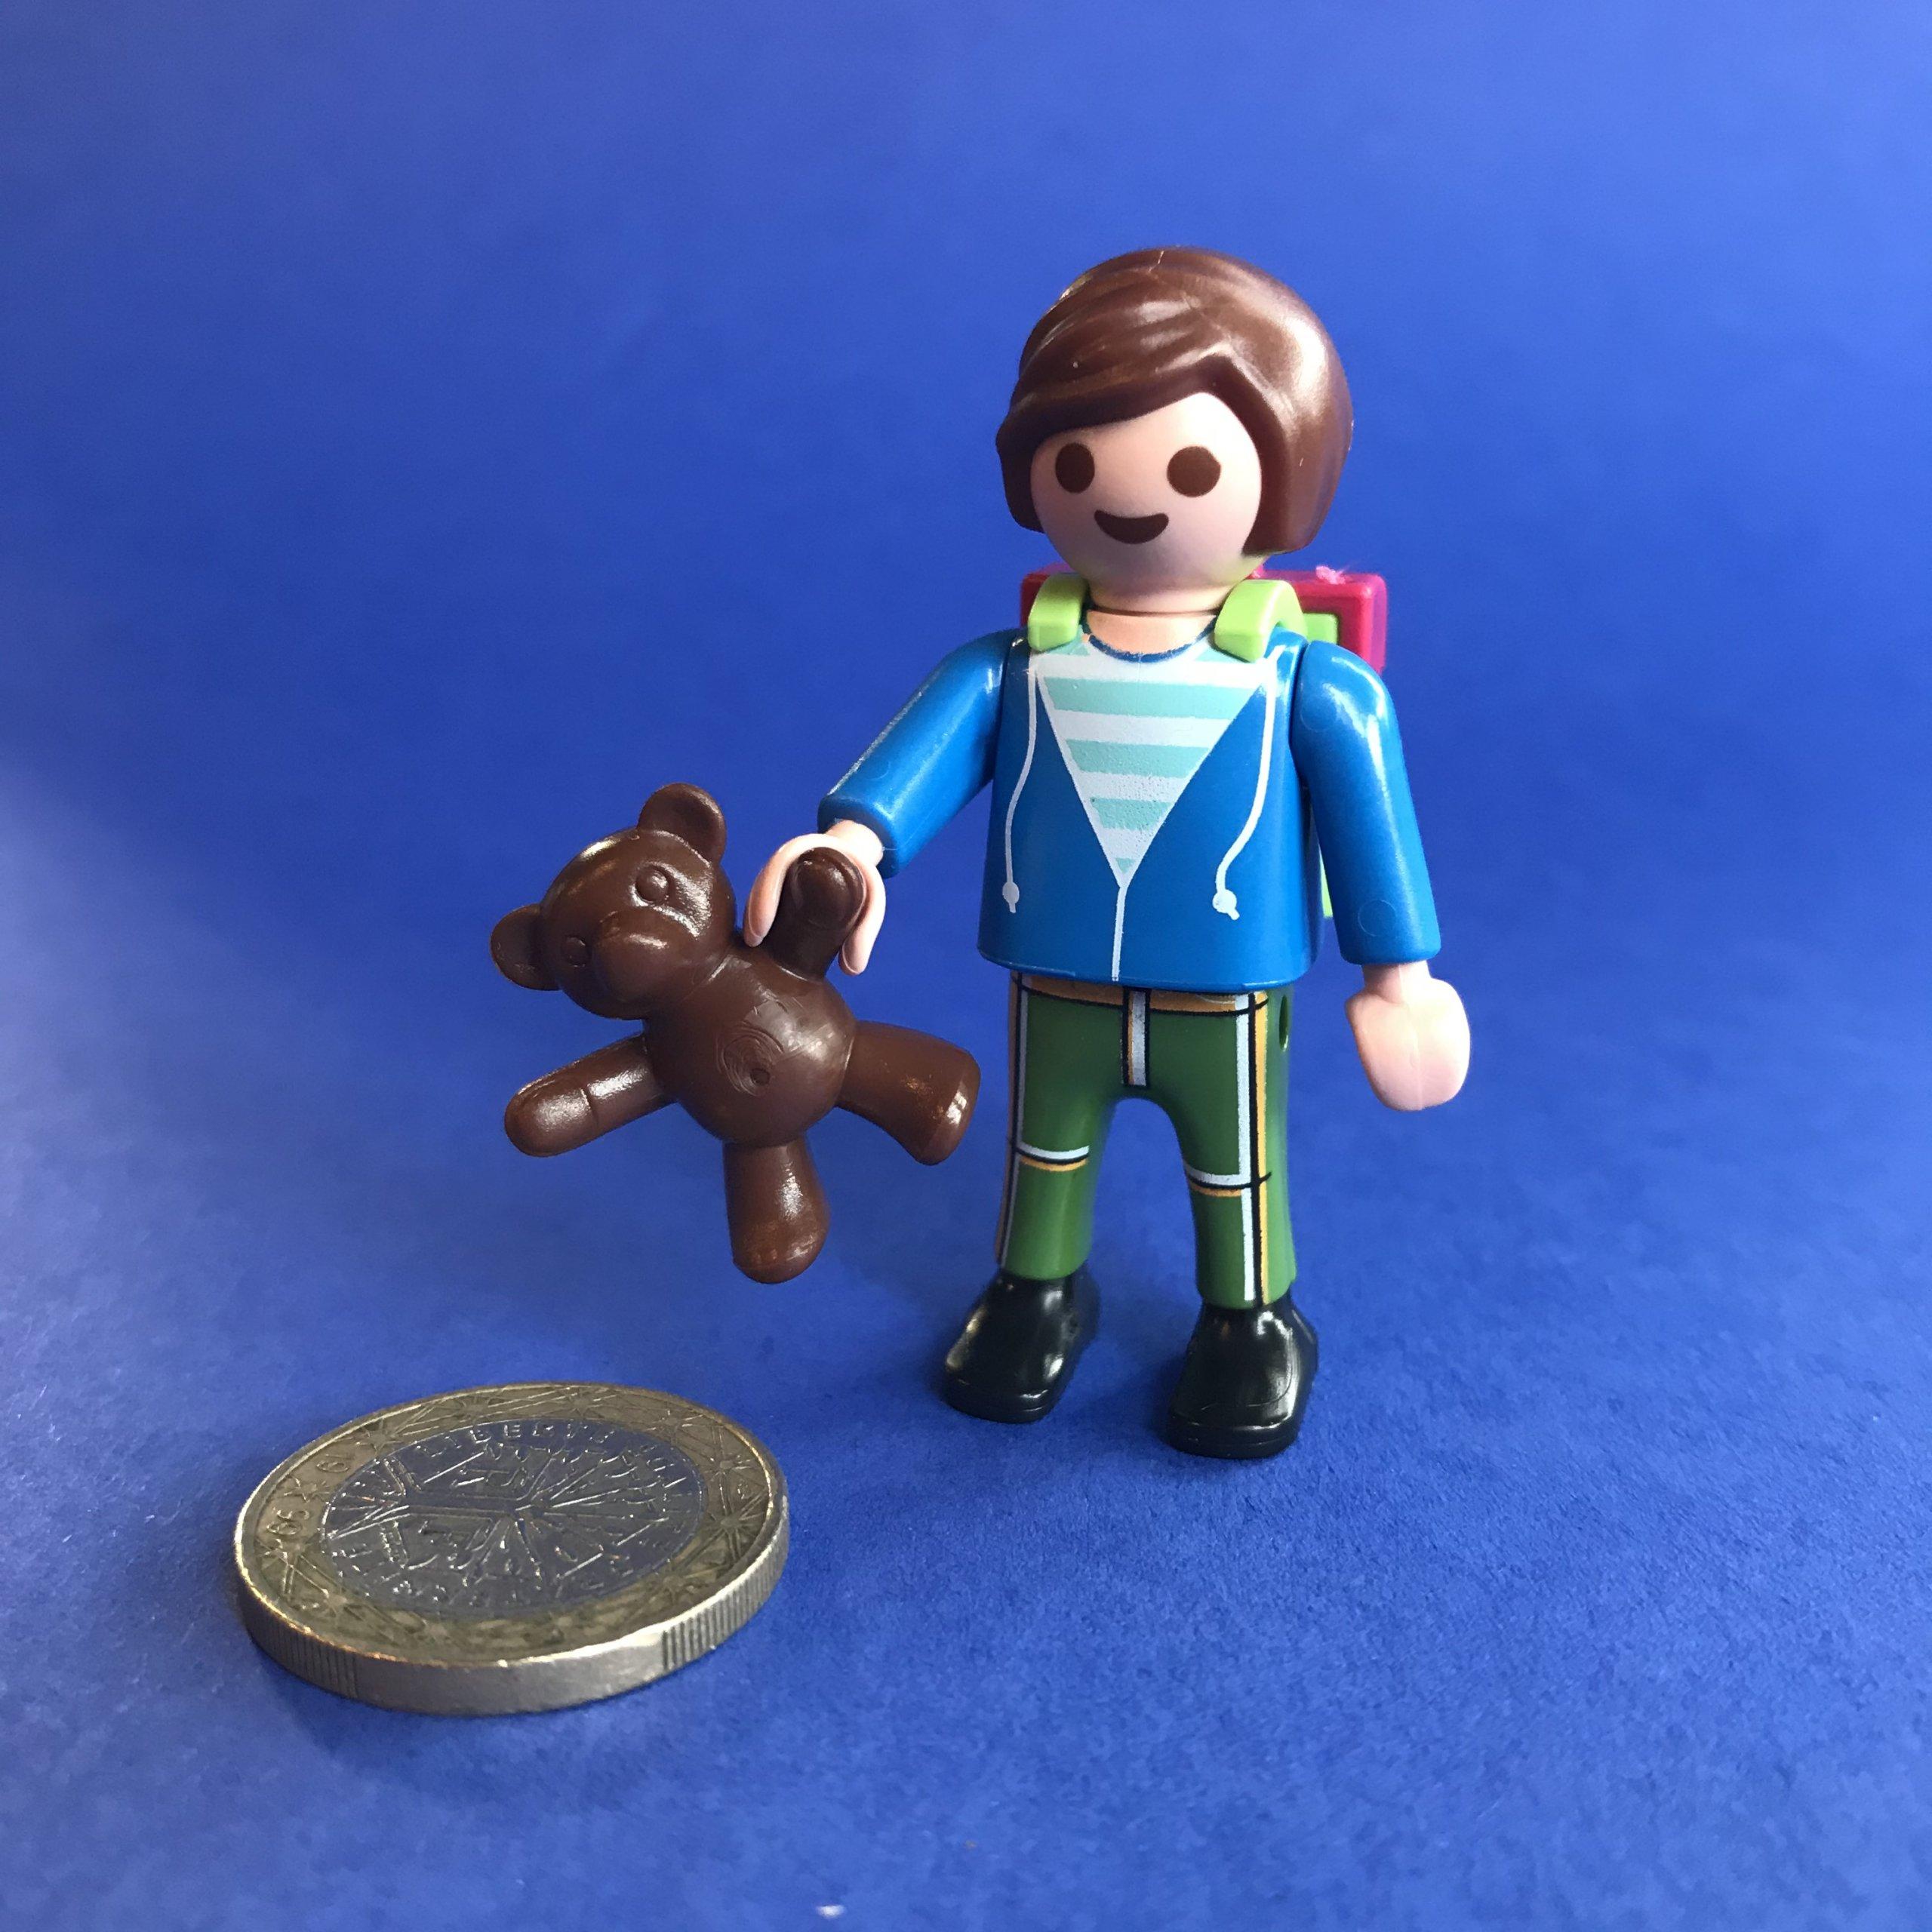 Playmobil-jongetje-rugzak